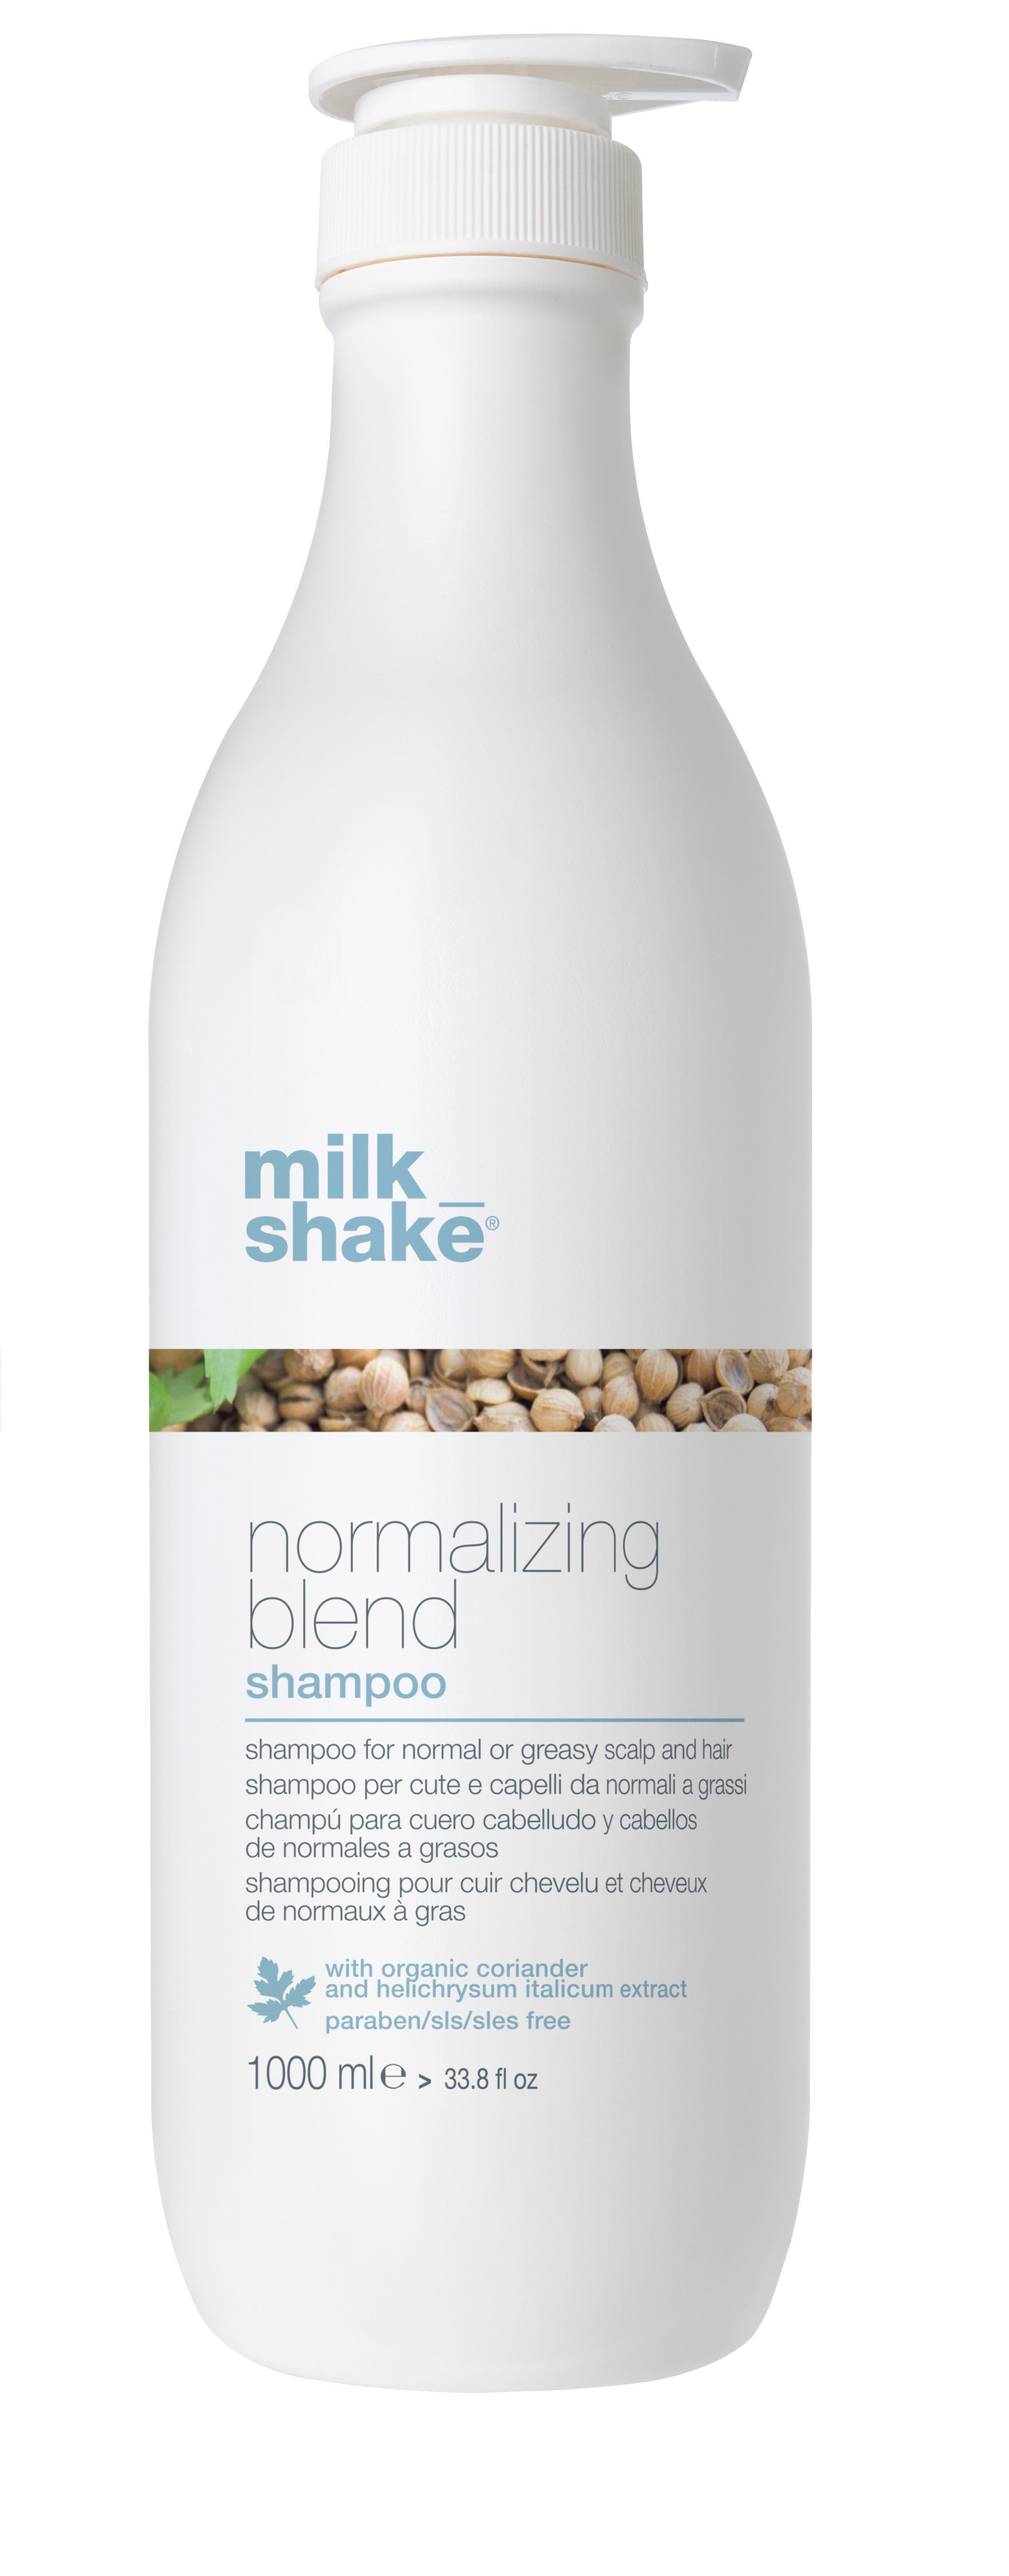 milk_shake - Normalizing Blend Shampoo 1000 ml